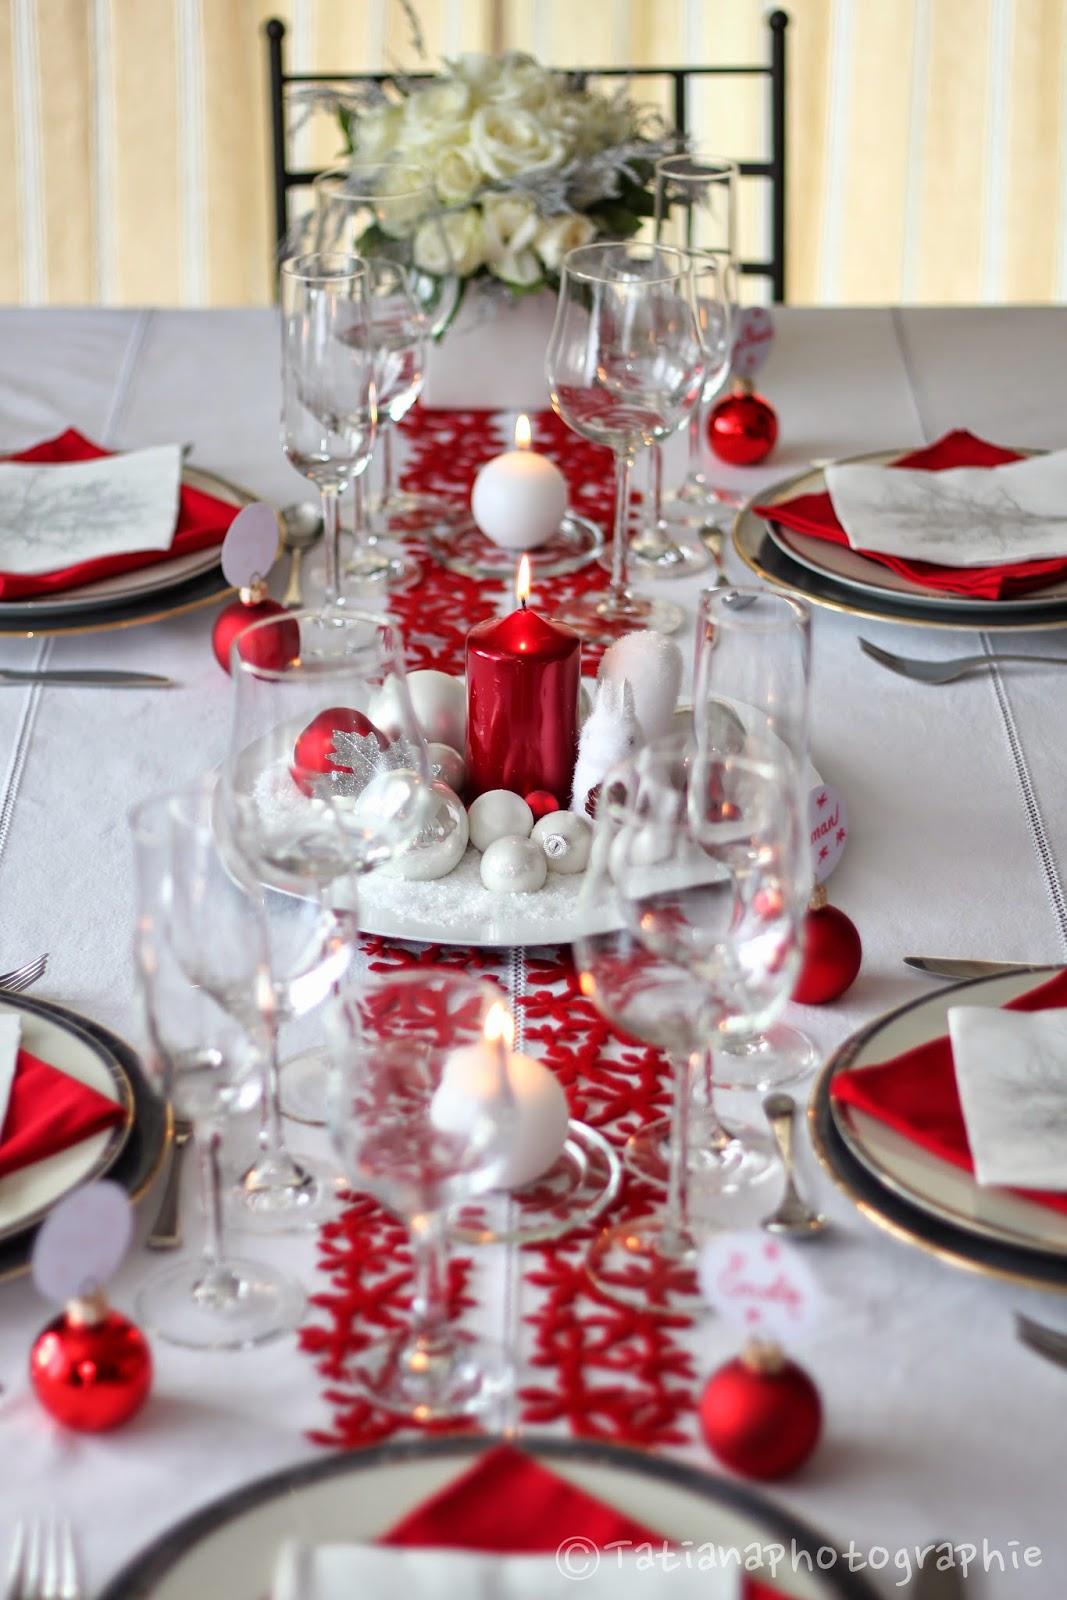 #B51626 MES P'TITS BONHEURS : NOËL EN ÉTÉ 6155 decoration de table de noel 2014 1067x1600 px @ aertt.com